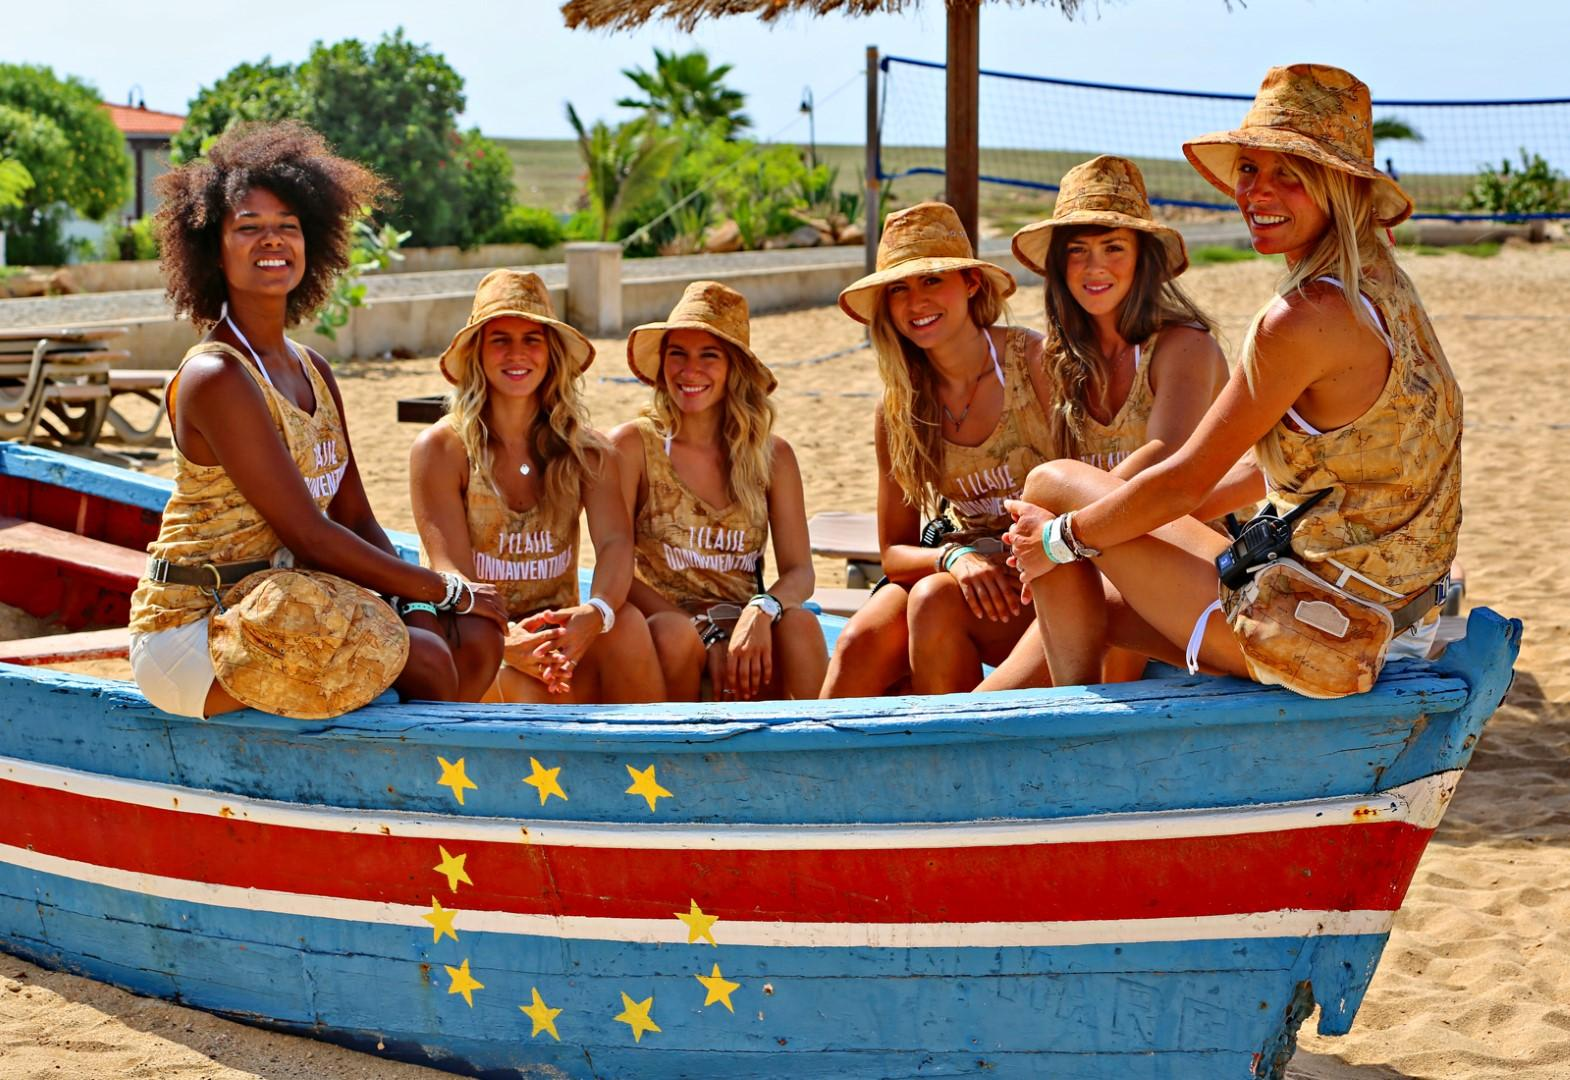 Donnavventura: le bellezze di Capo Verde